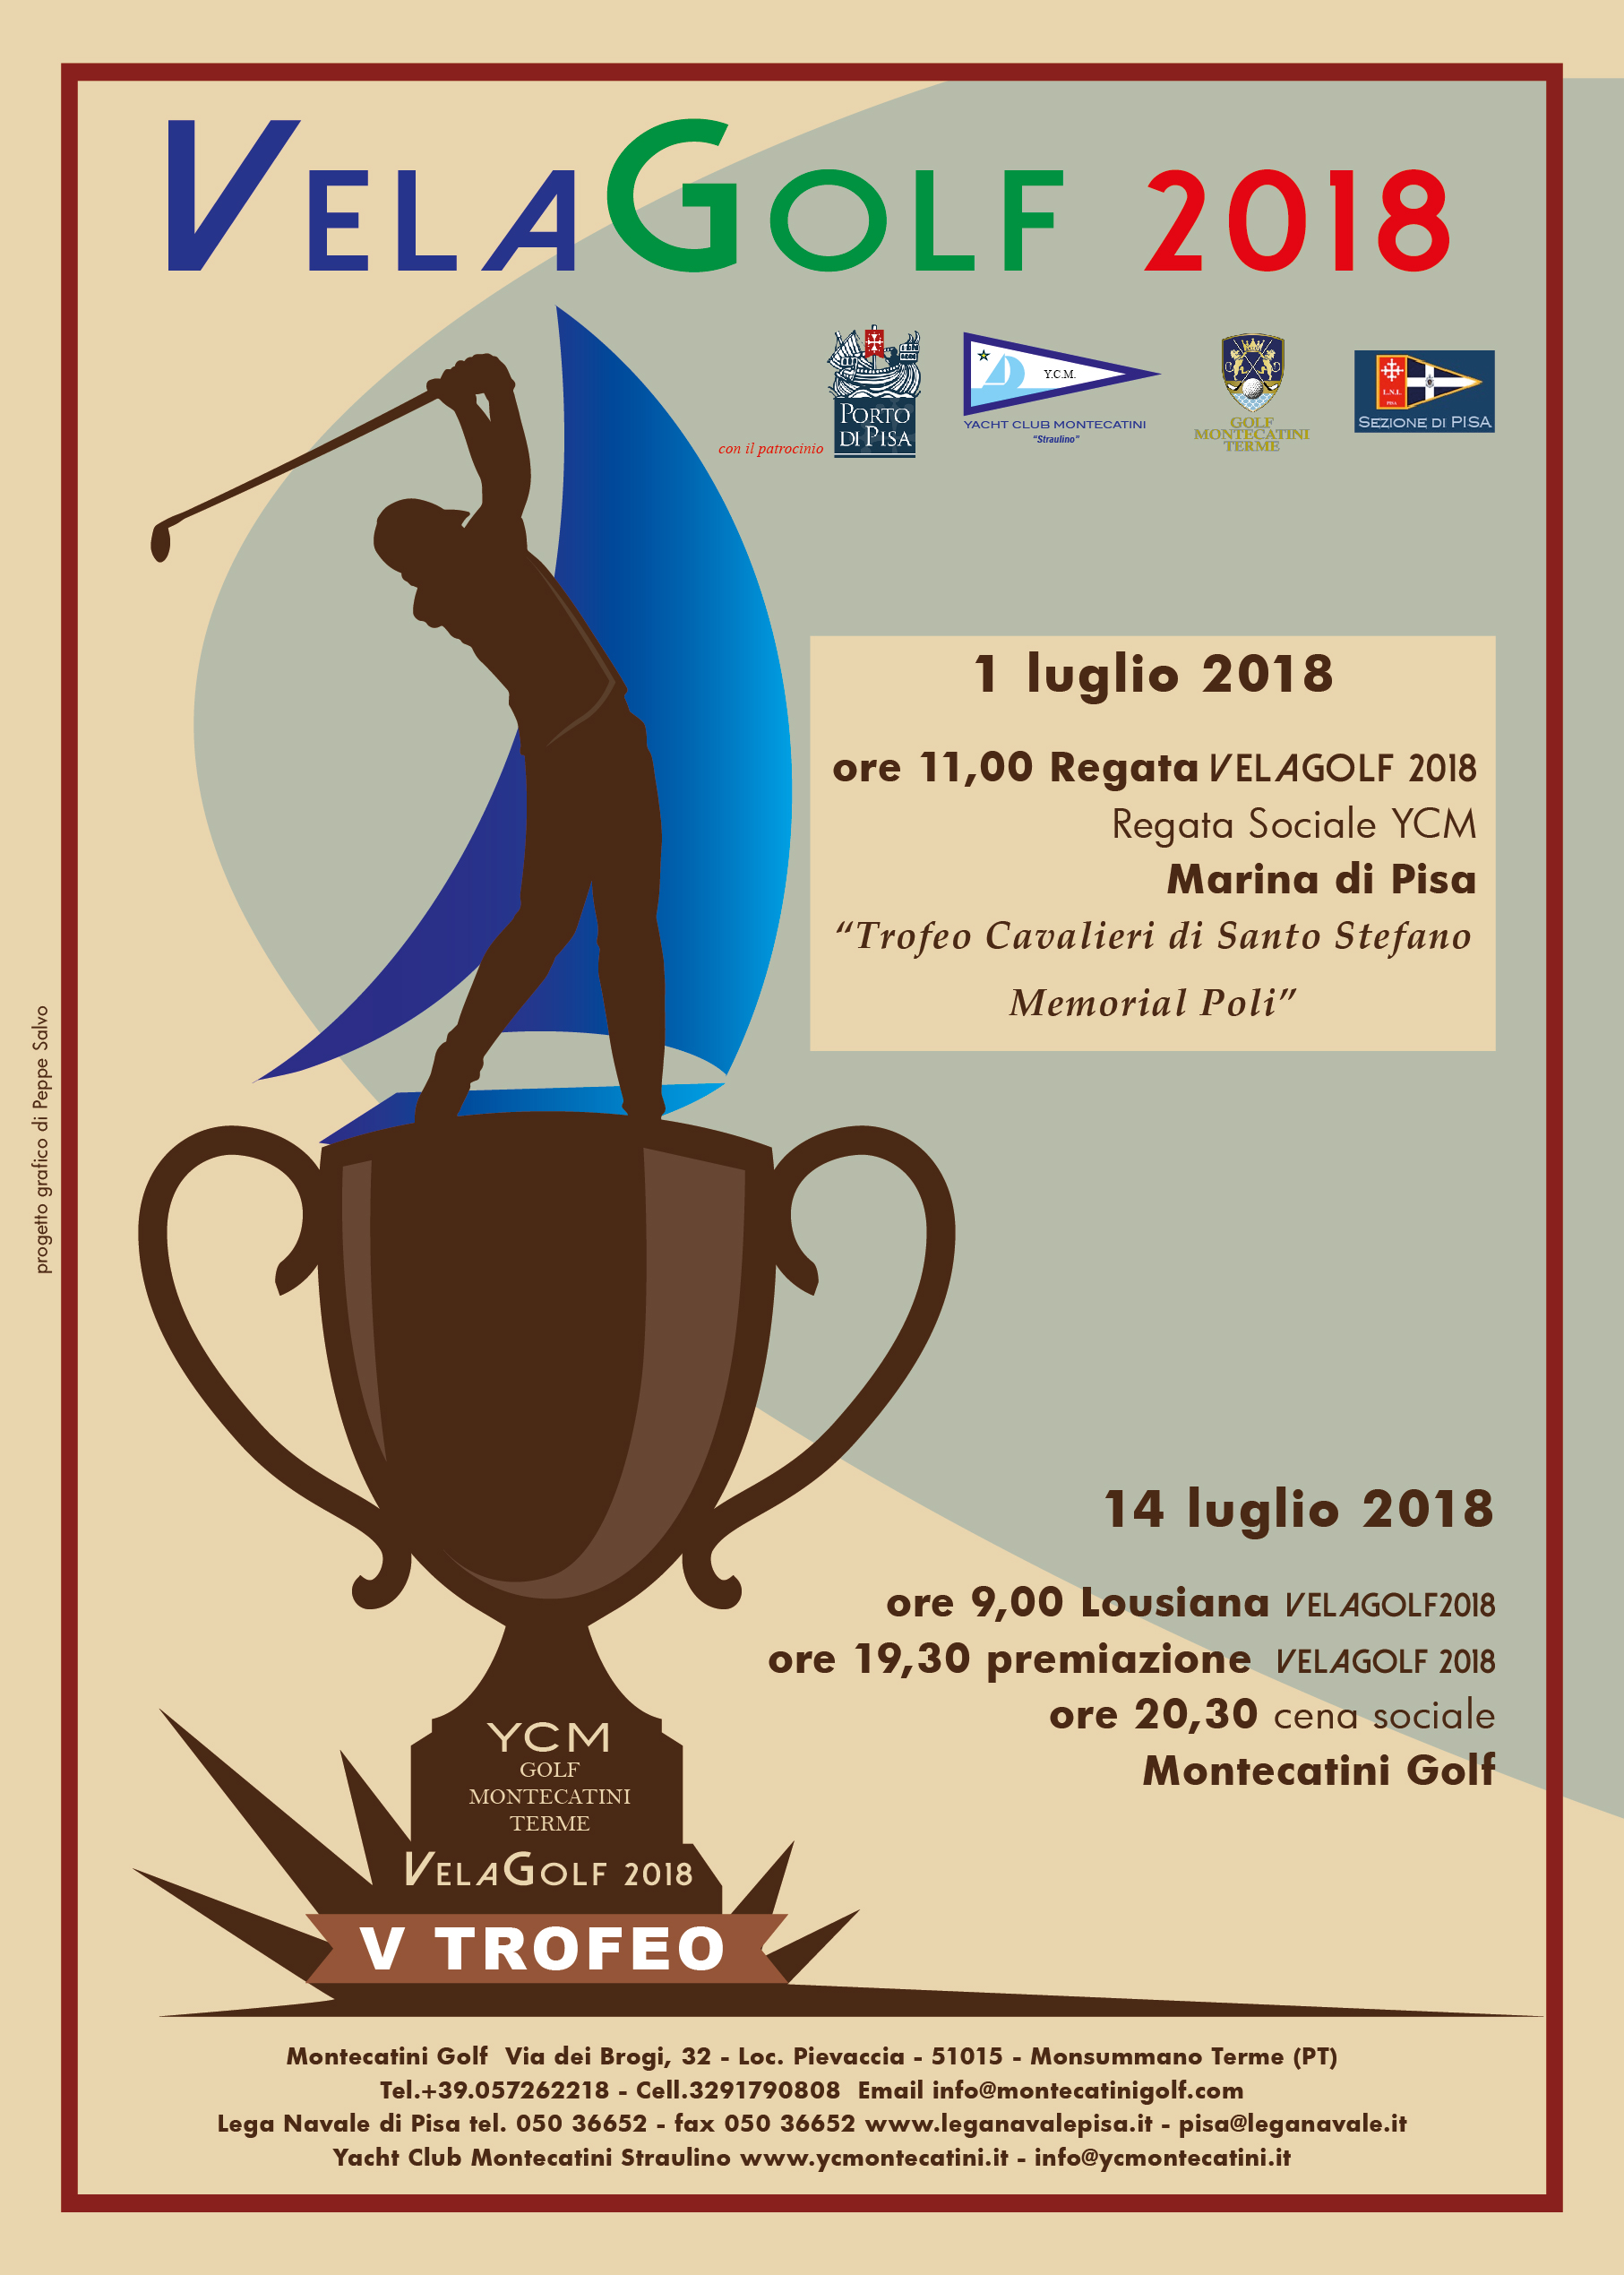 locandina-velagolf-2018-01